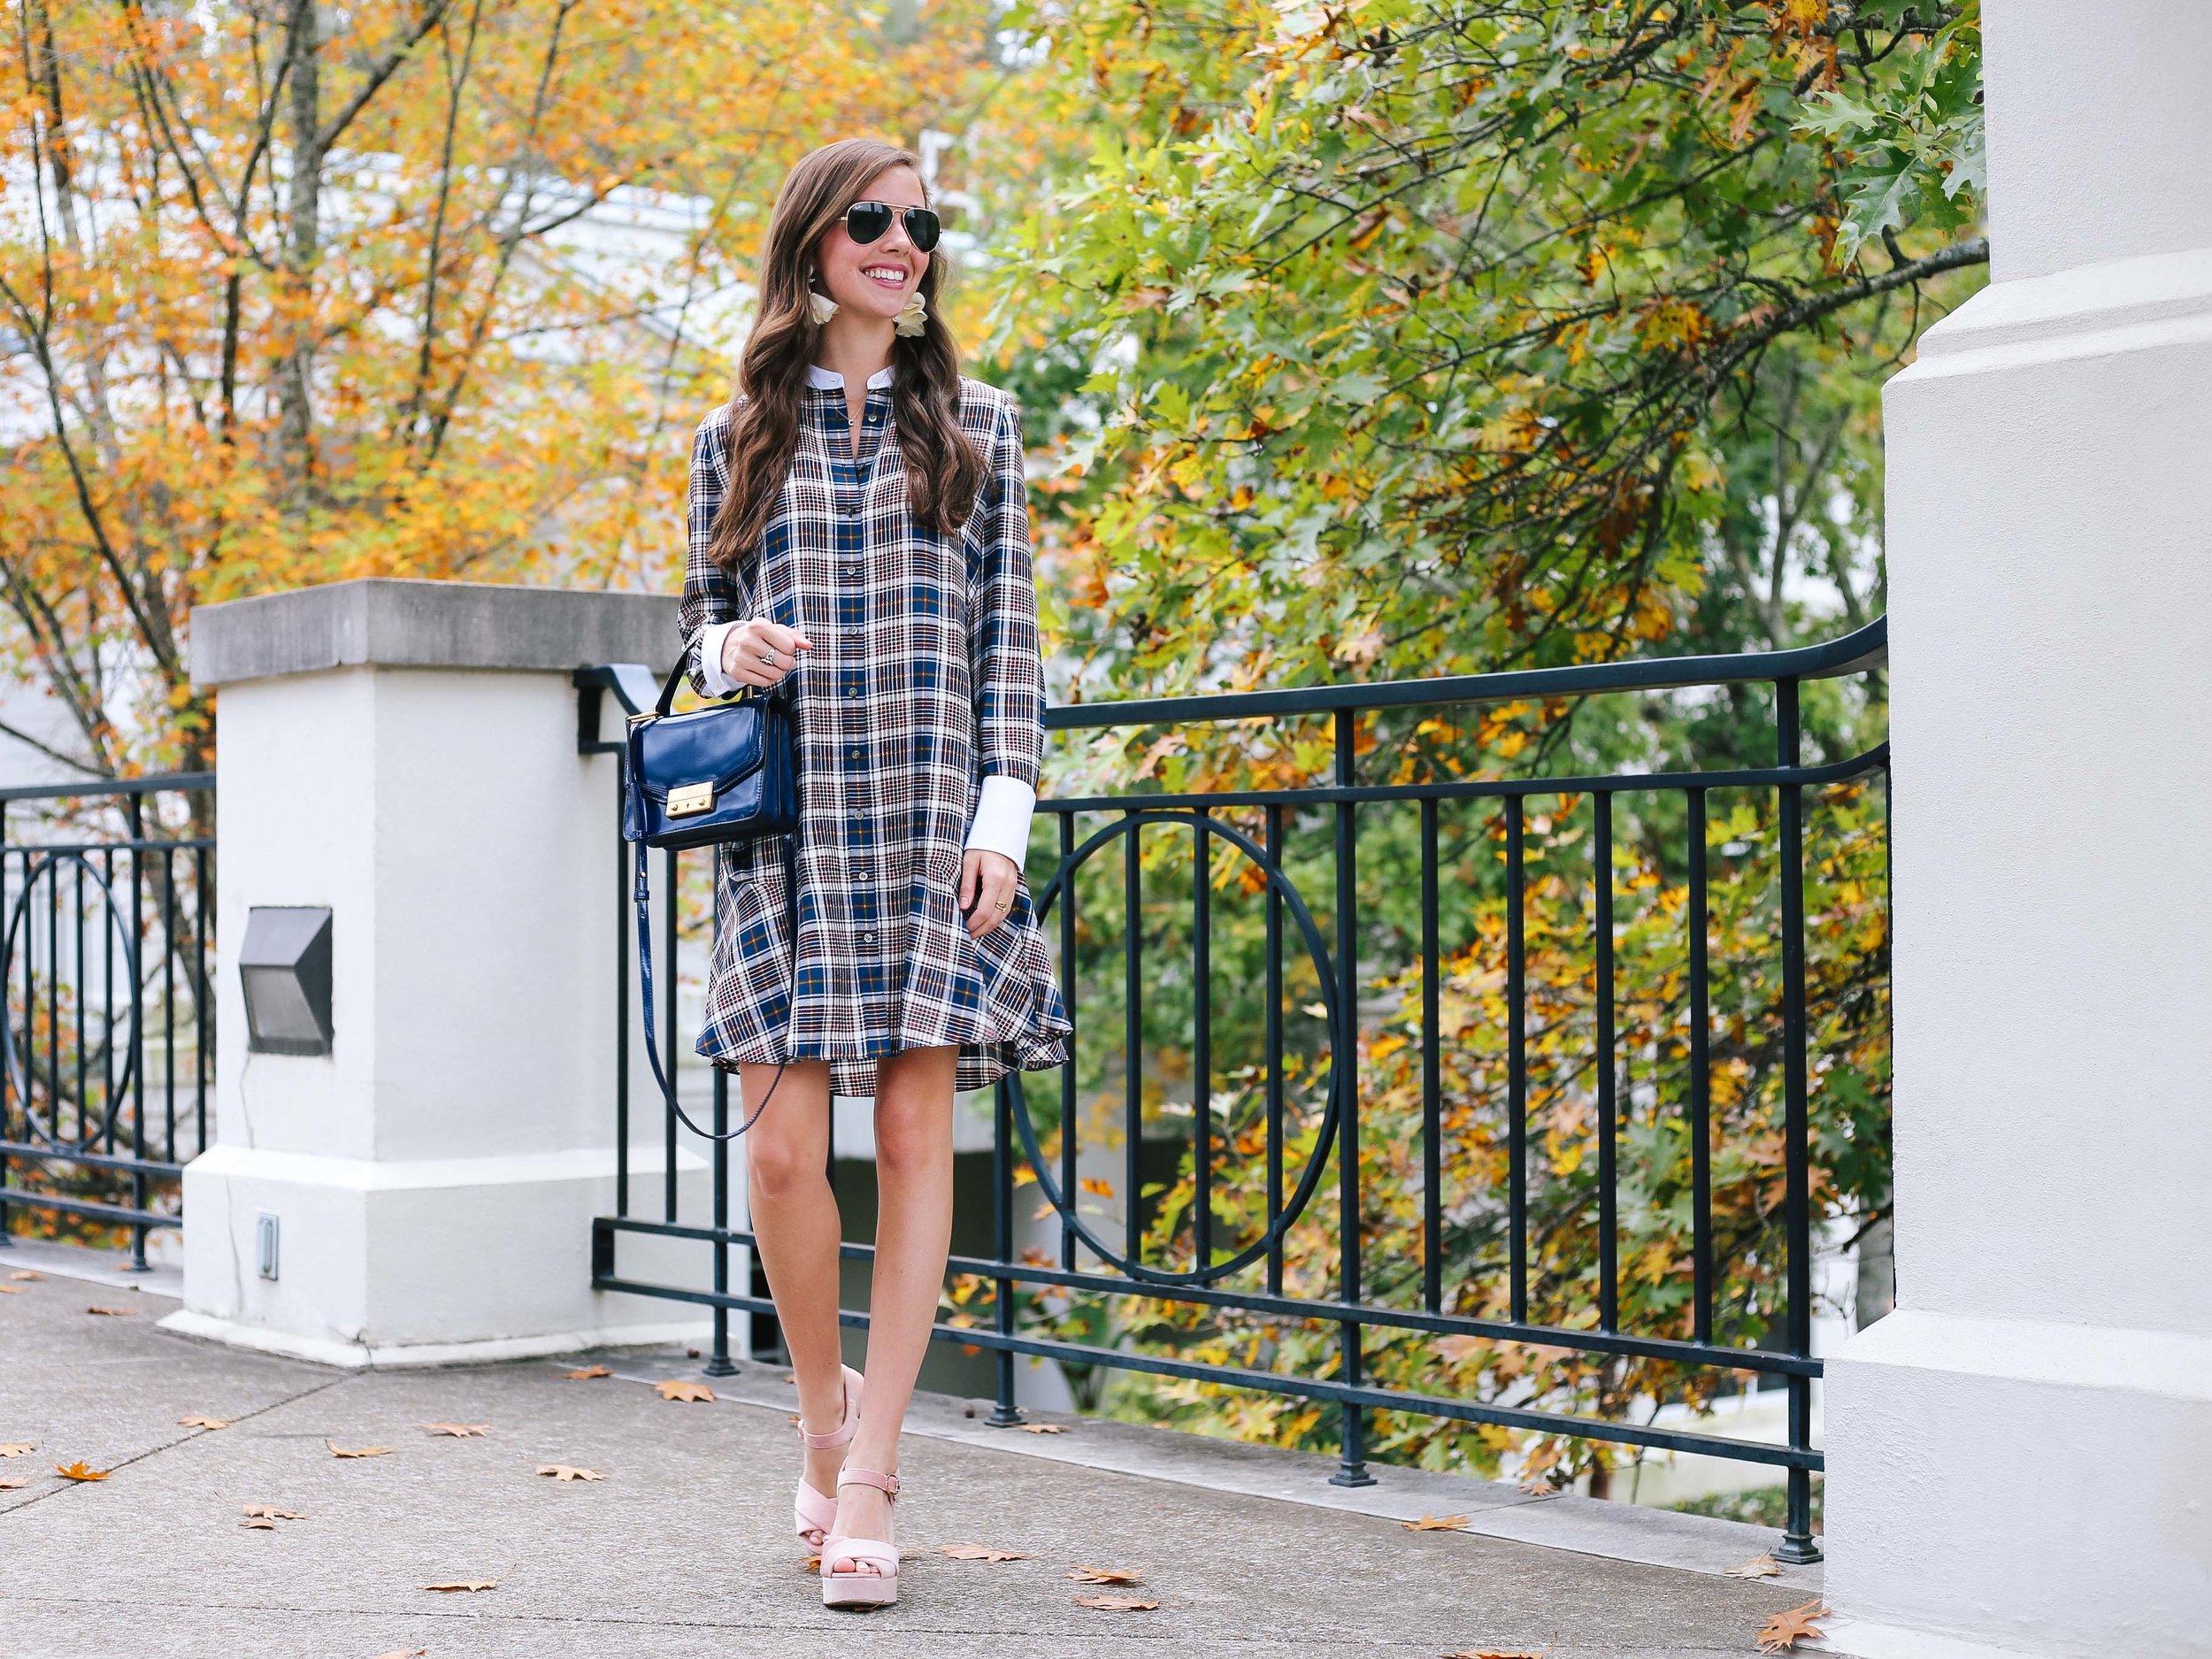 fashion blogger lcb style tory burch dress (15 of 35).jpg